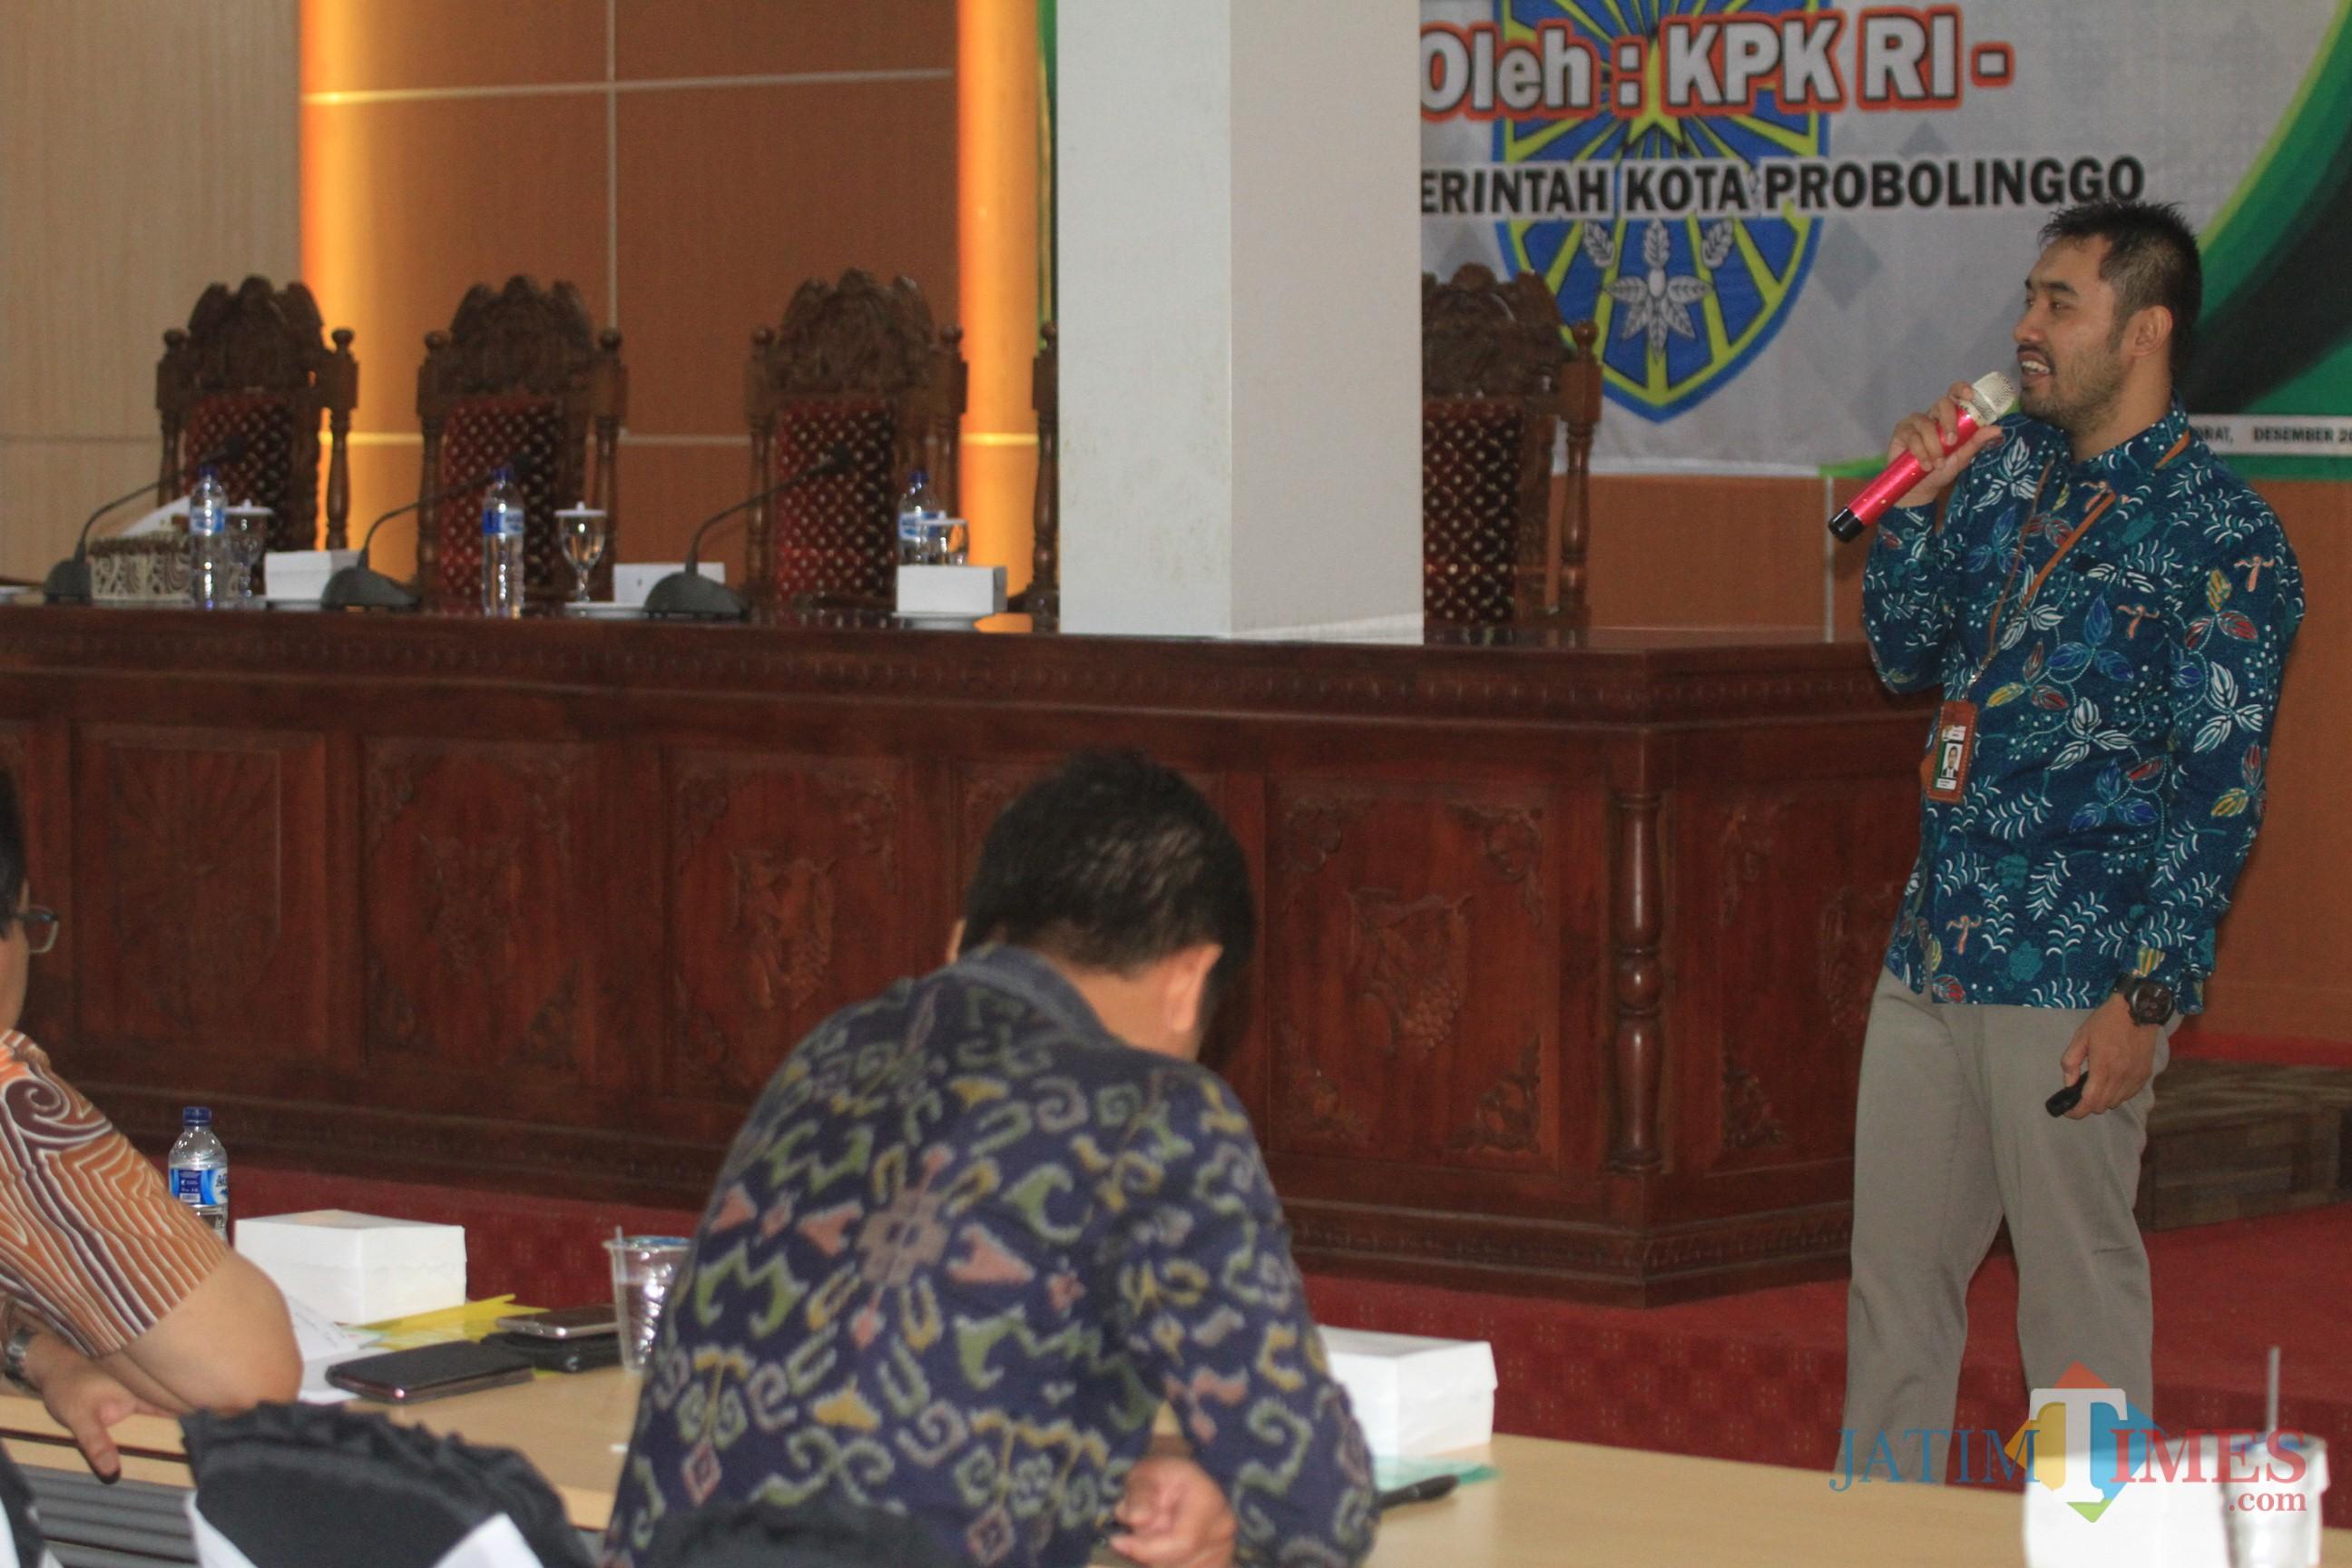 Anjas Prasetyo, Gratifikasi Direktorat Gratifikasi, Deputi Bidang Pencegahan KPK RI (Agus Salam/Jatim TIMES)